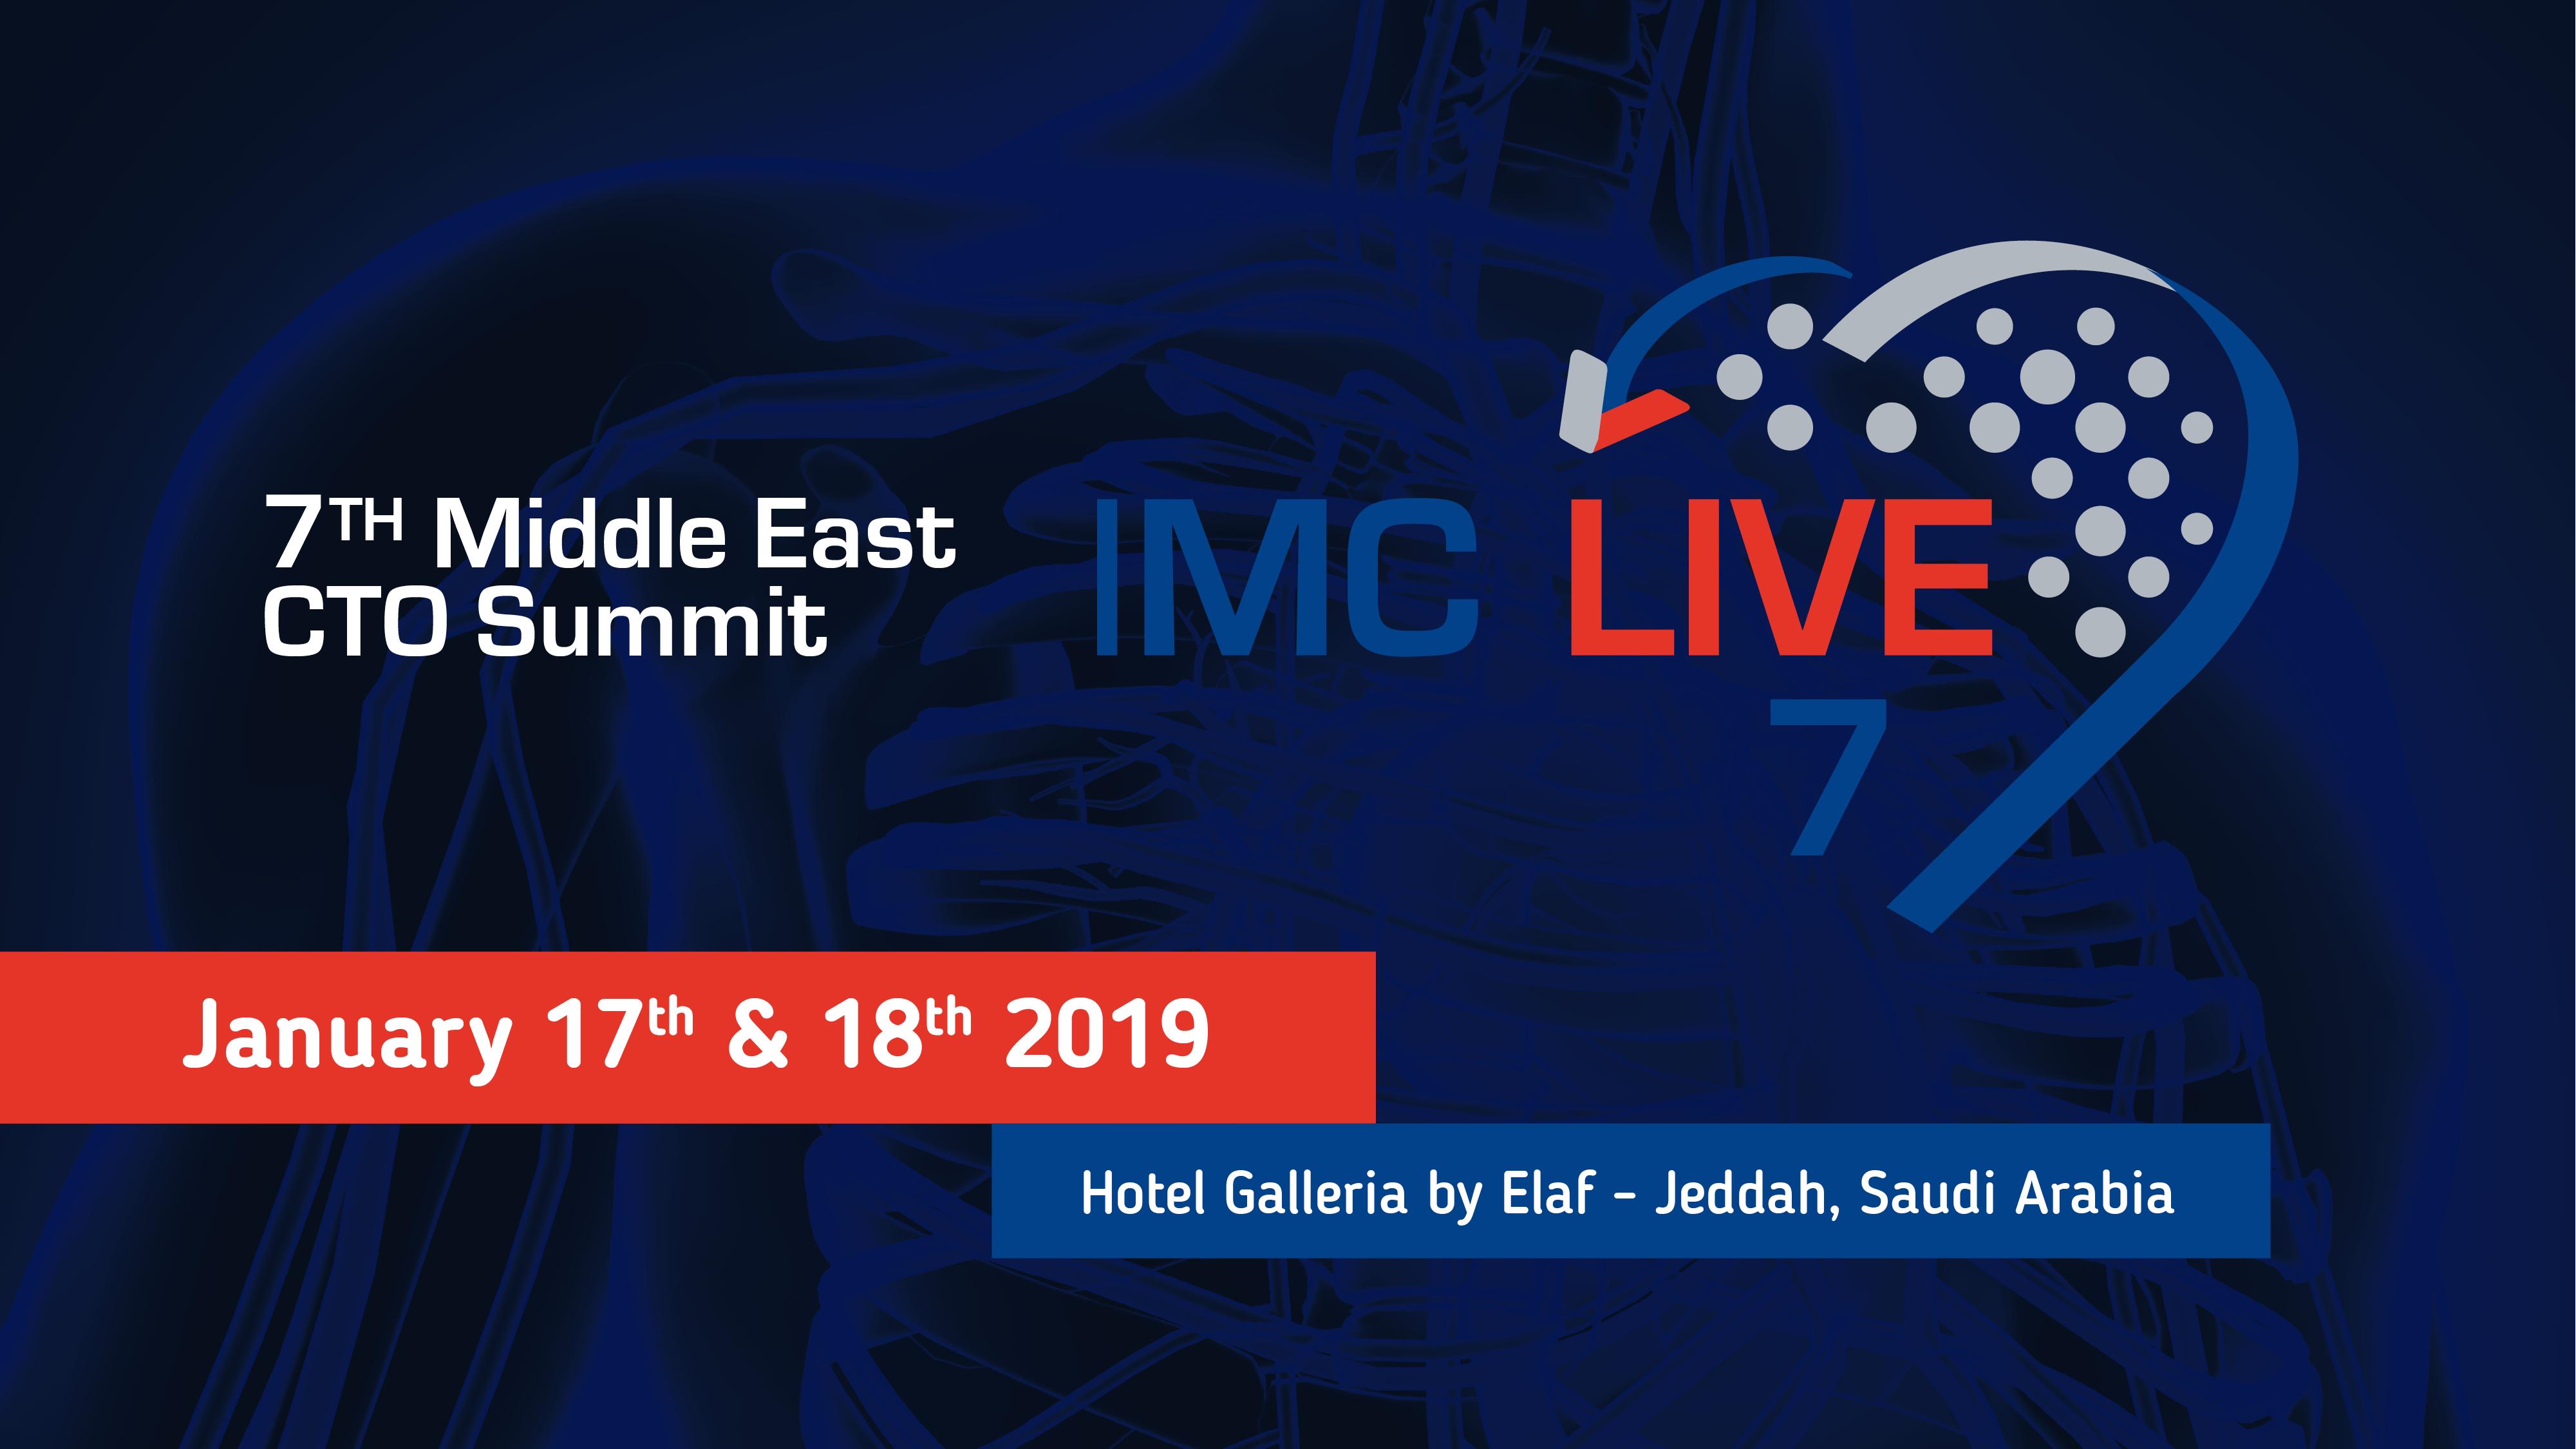 IMC LIVE 2019: Live Case #10